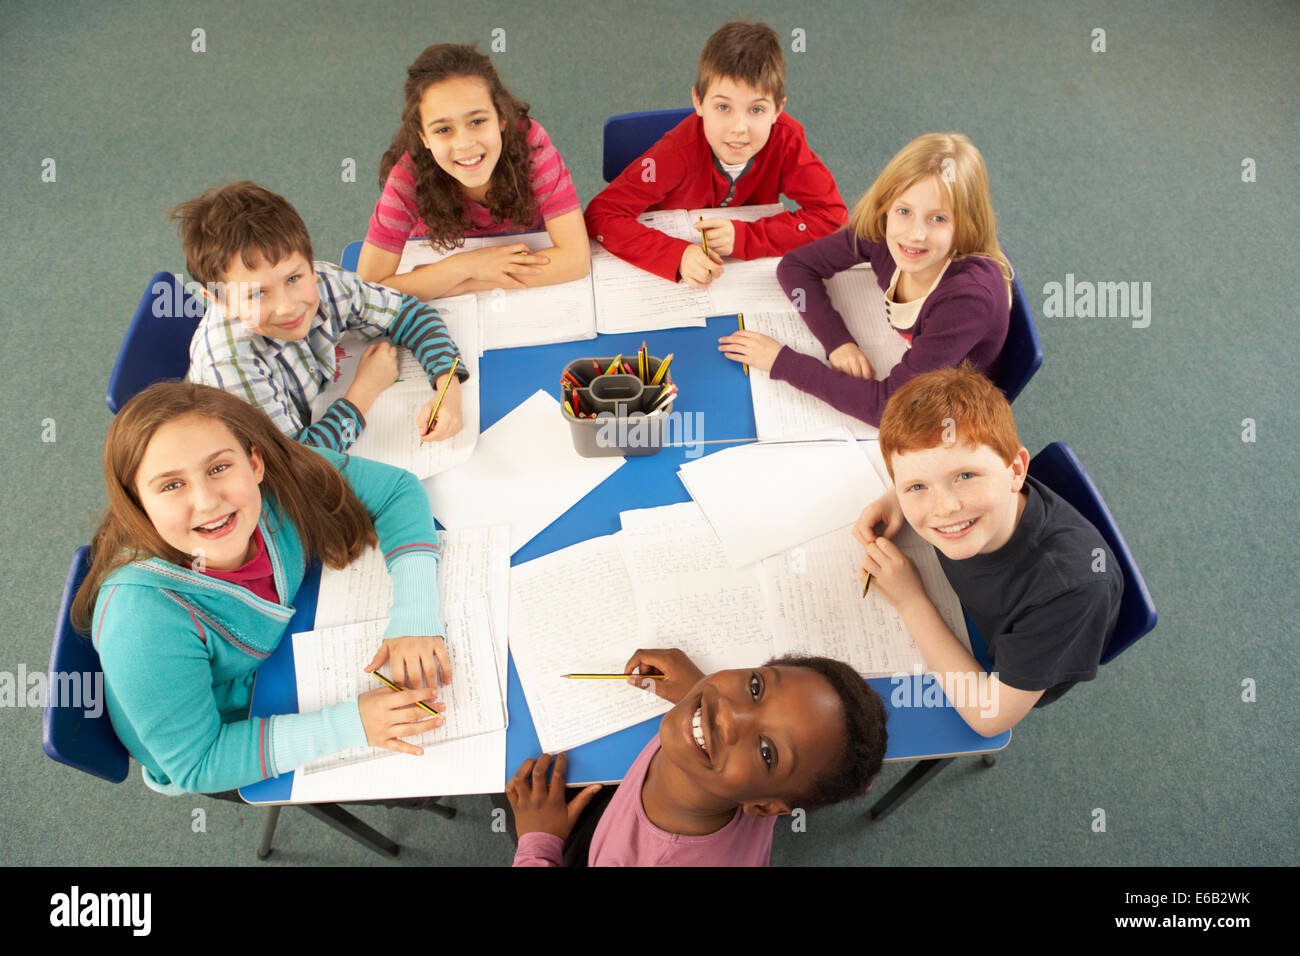 Teamwork Elementary Student School Class Stock Photo